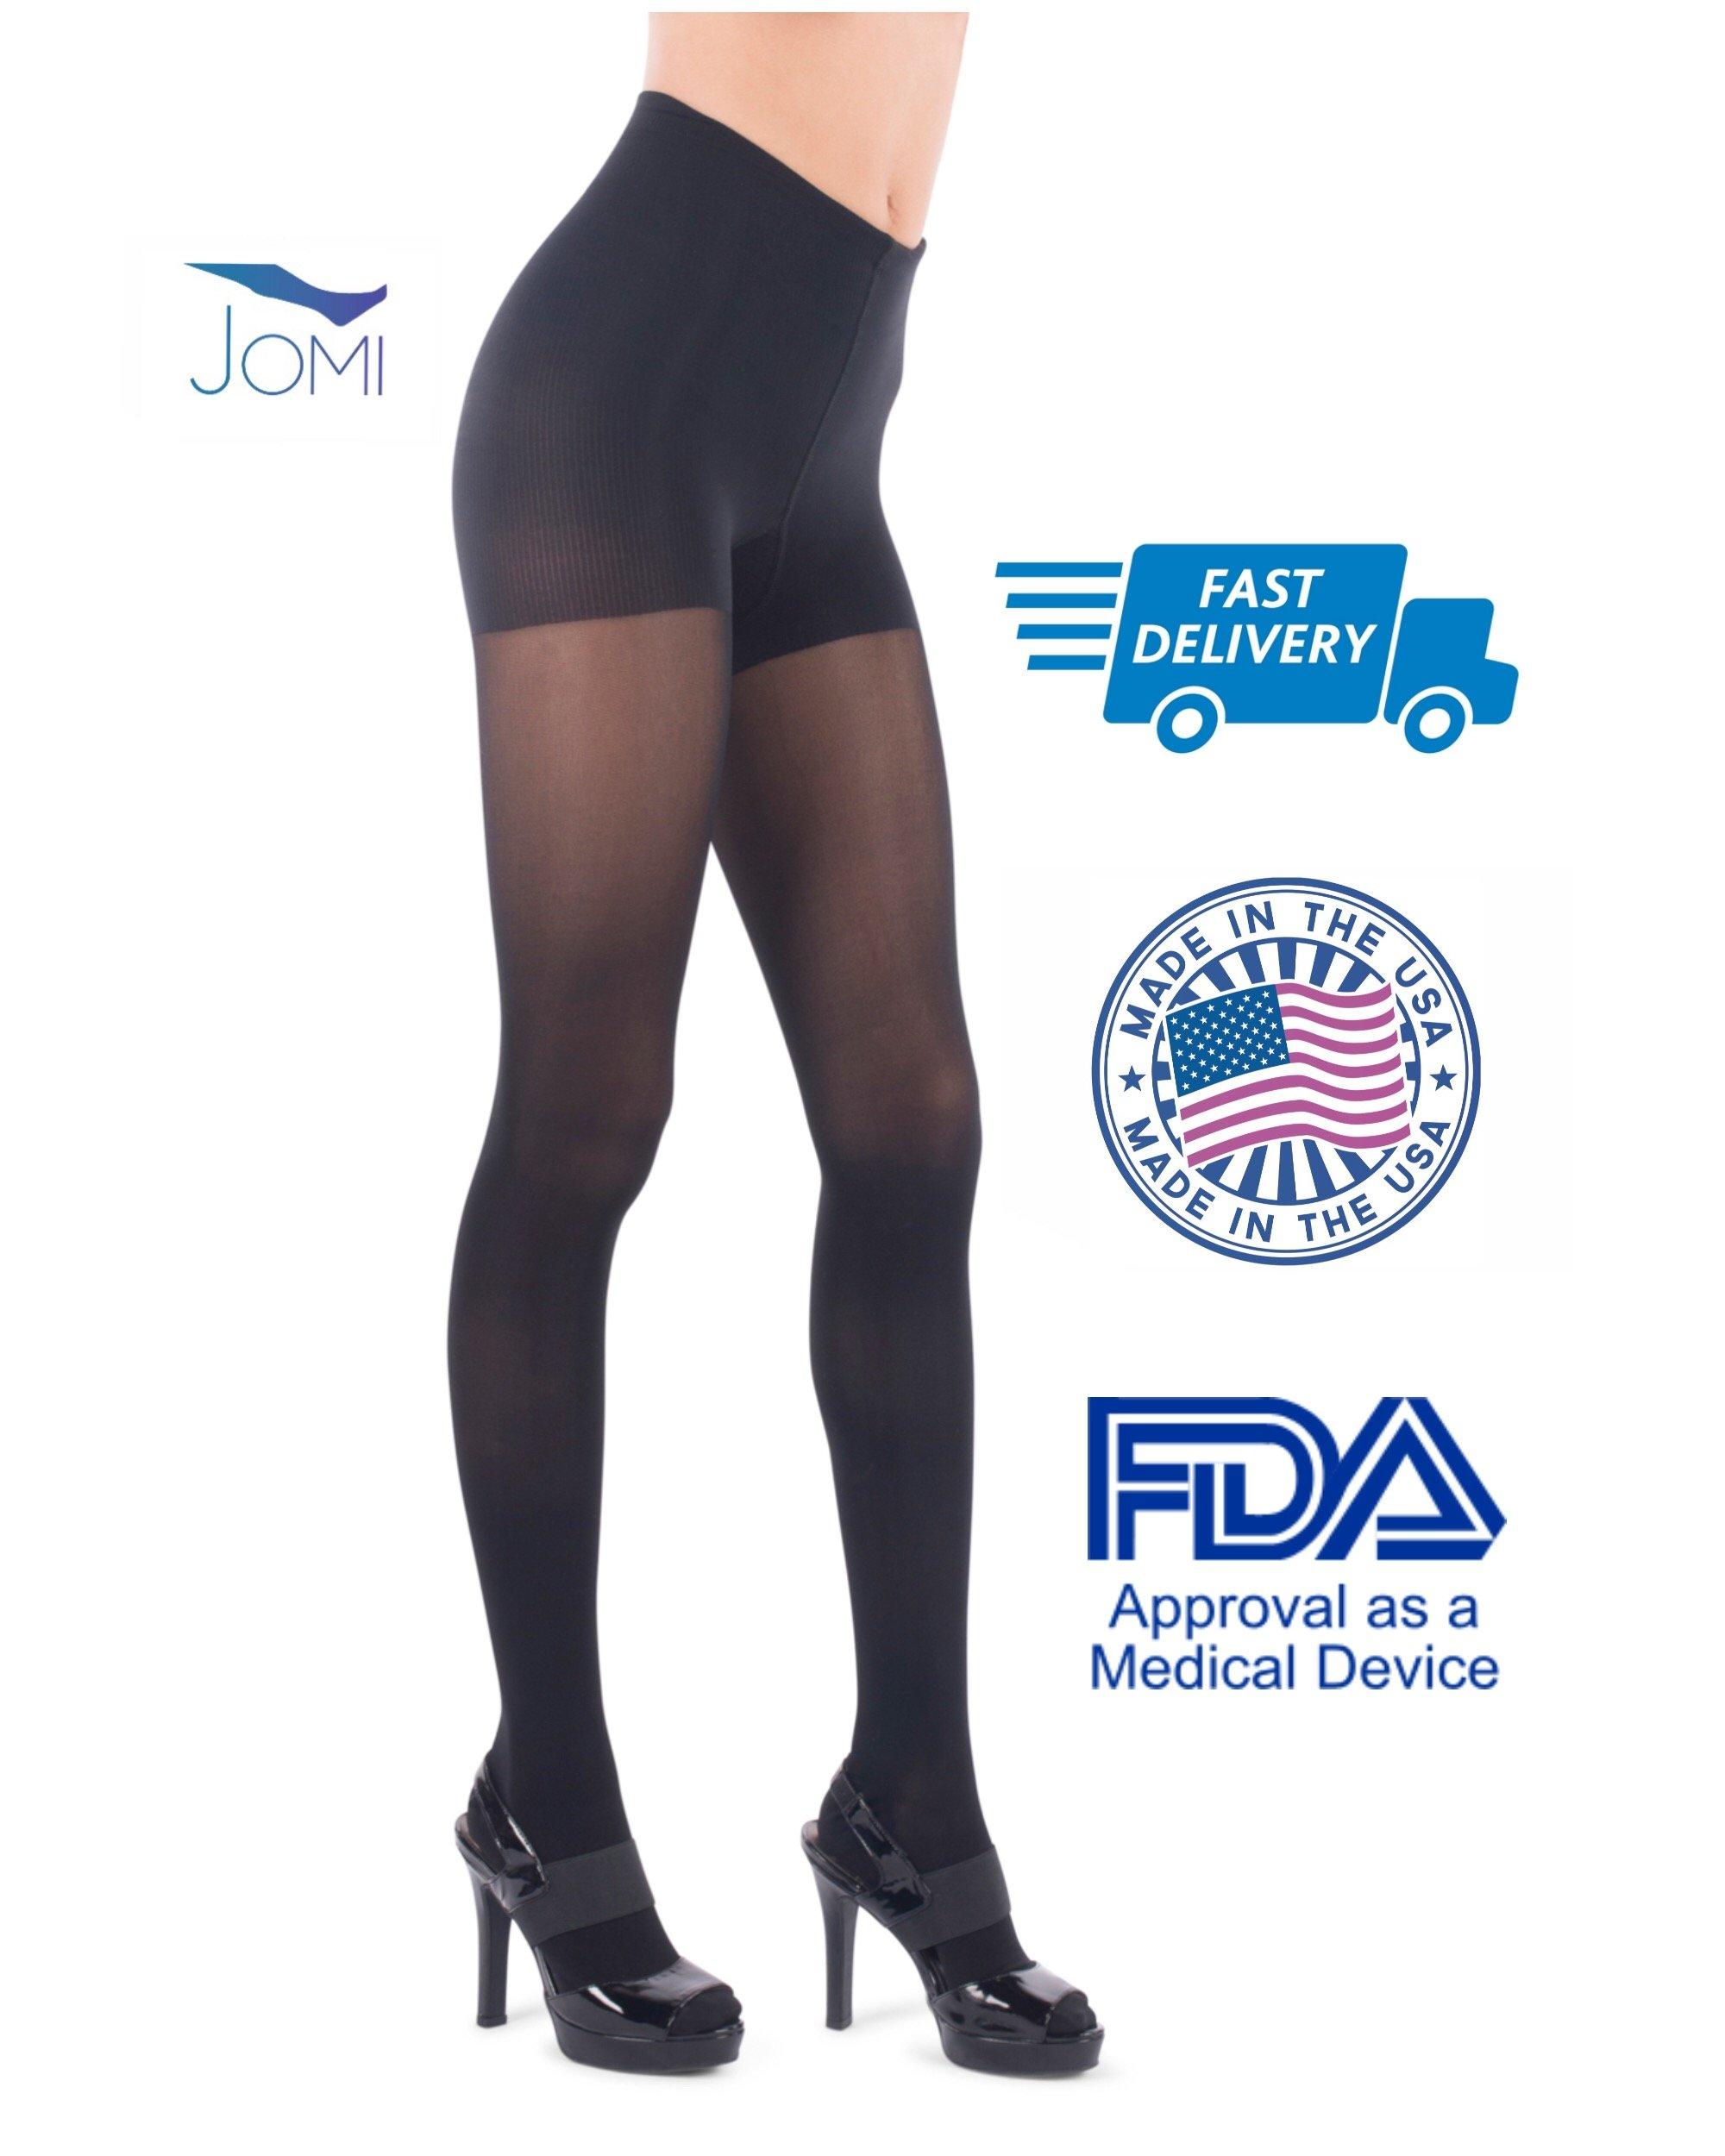 Jomi Compression Pantyhose Women Collection, 20-30mmHg Sheer Closed Toe 276 (Medium, Black)